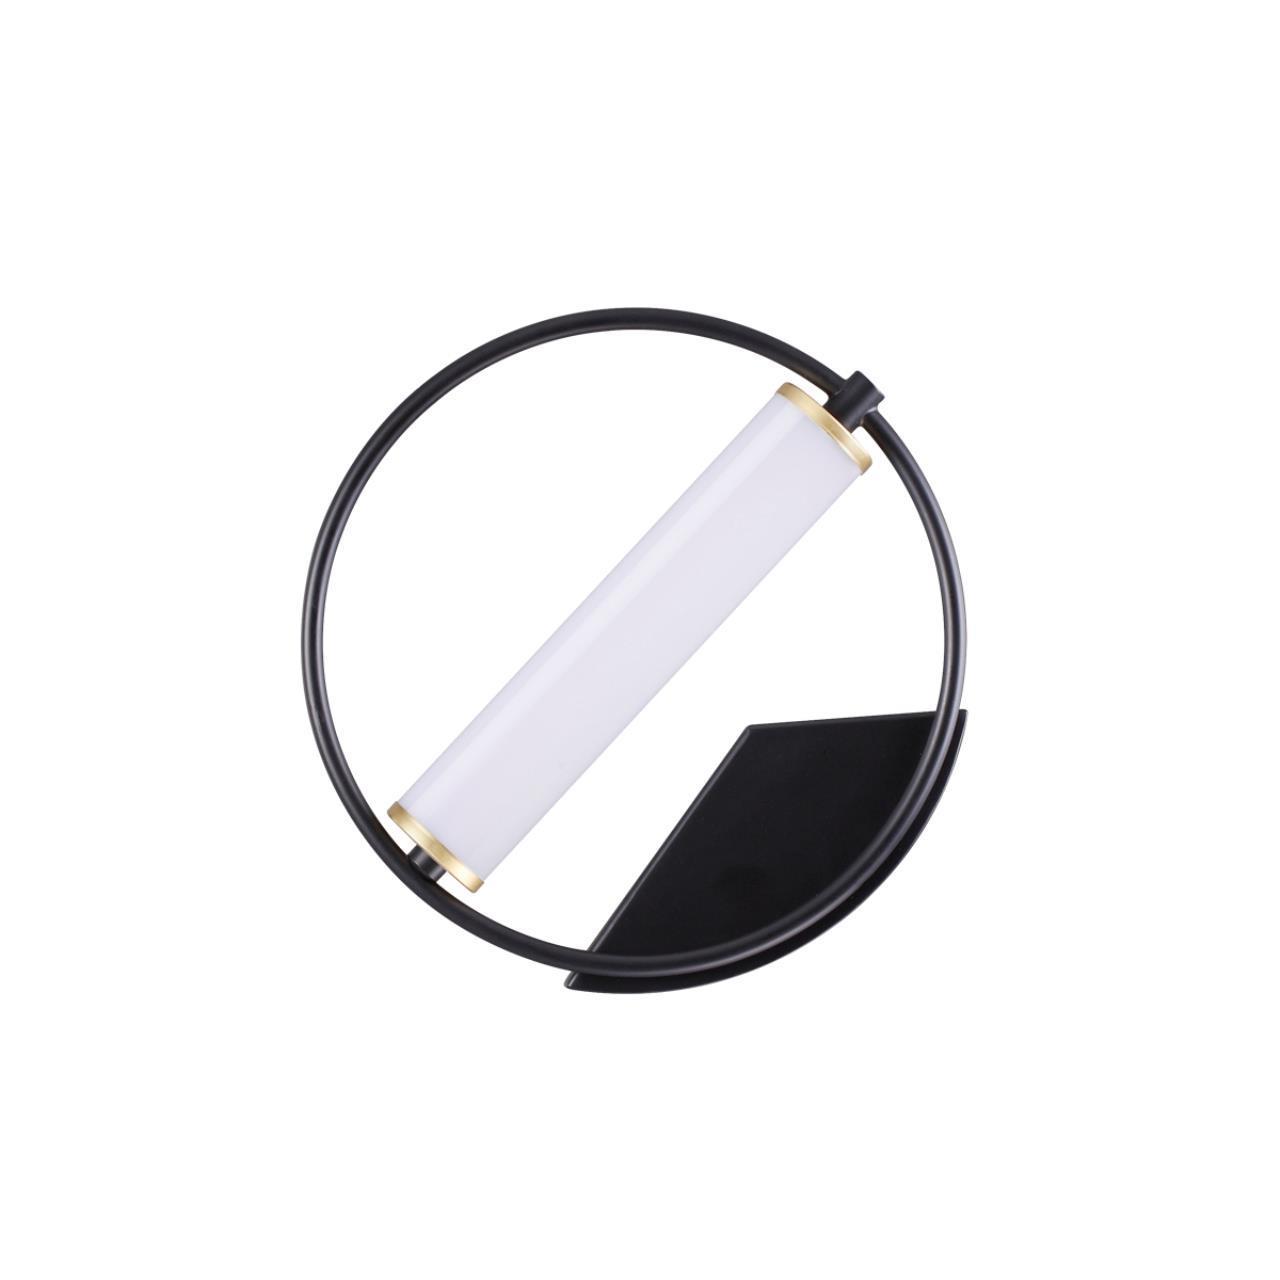 3905/6WL L-VISION ODL20 27 черный/золотистый/металл Настенный светильник LED 4000K 10W 220V BEBETTA